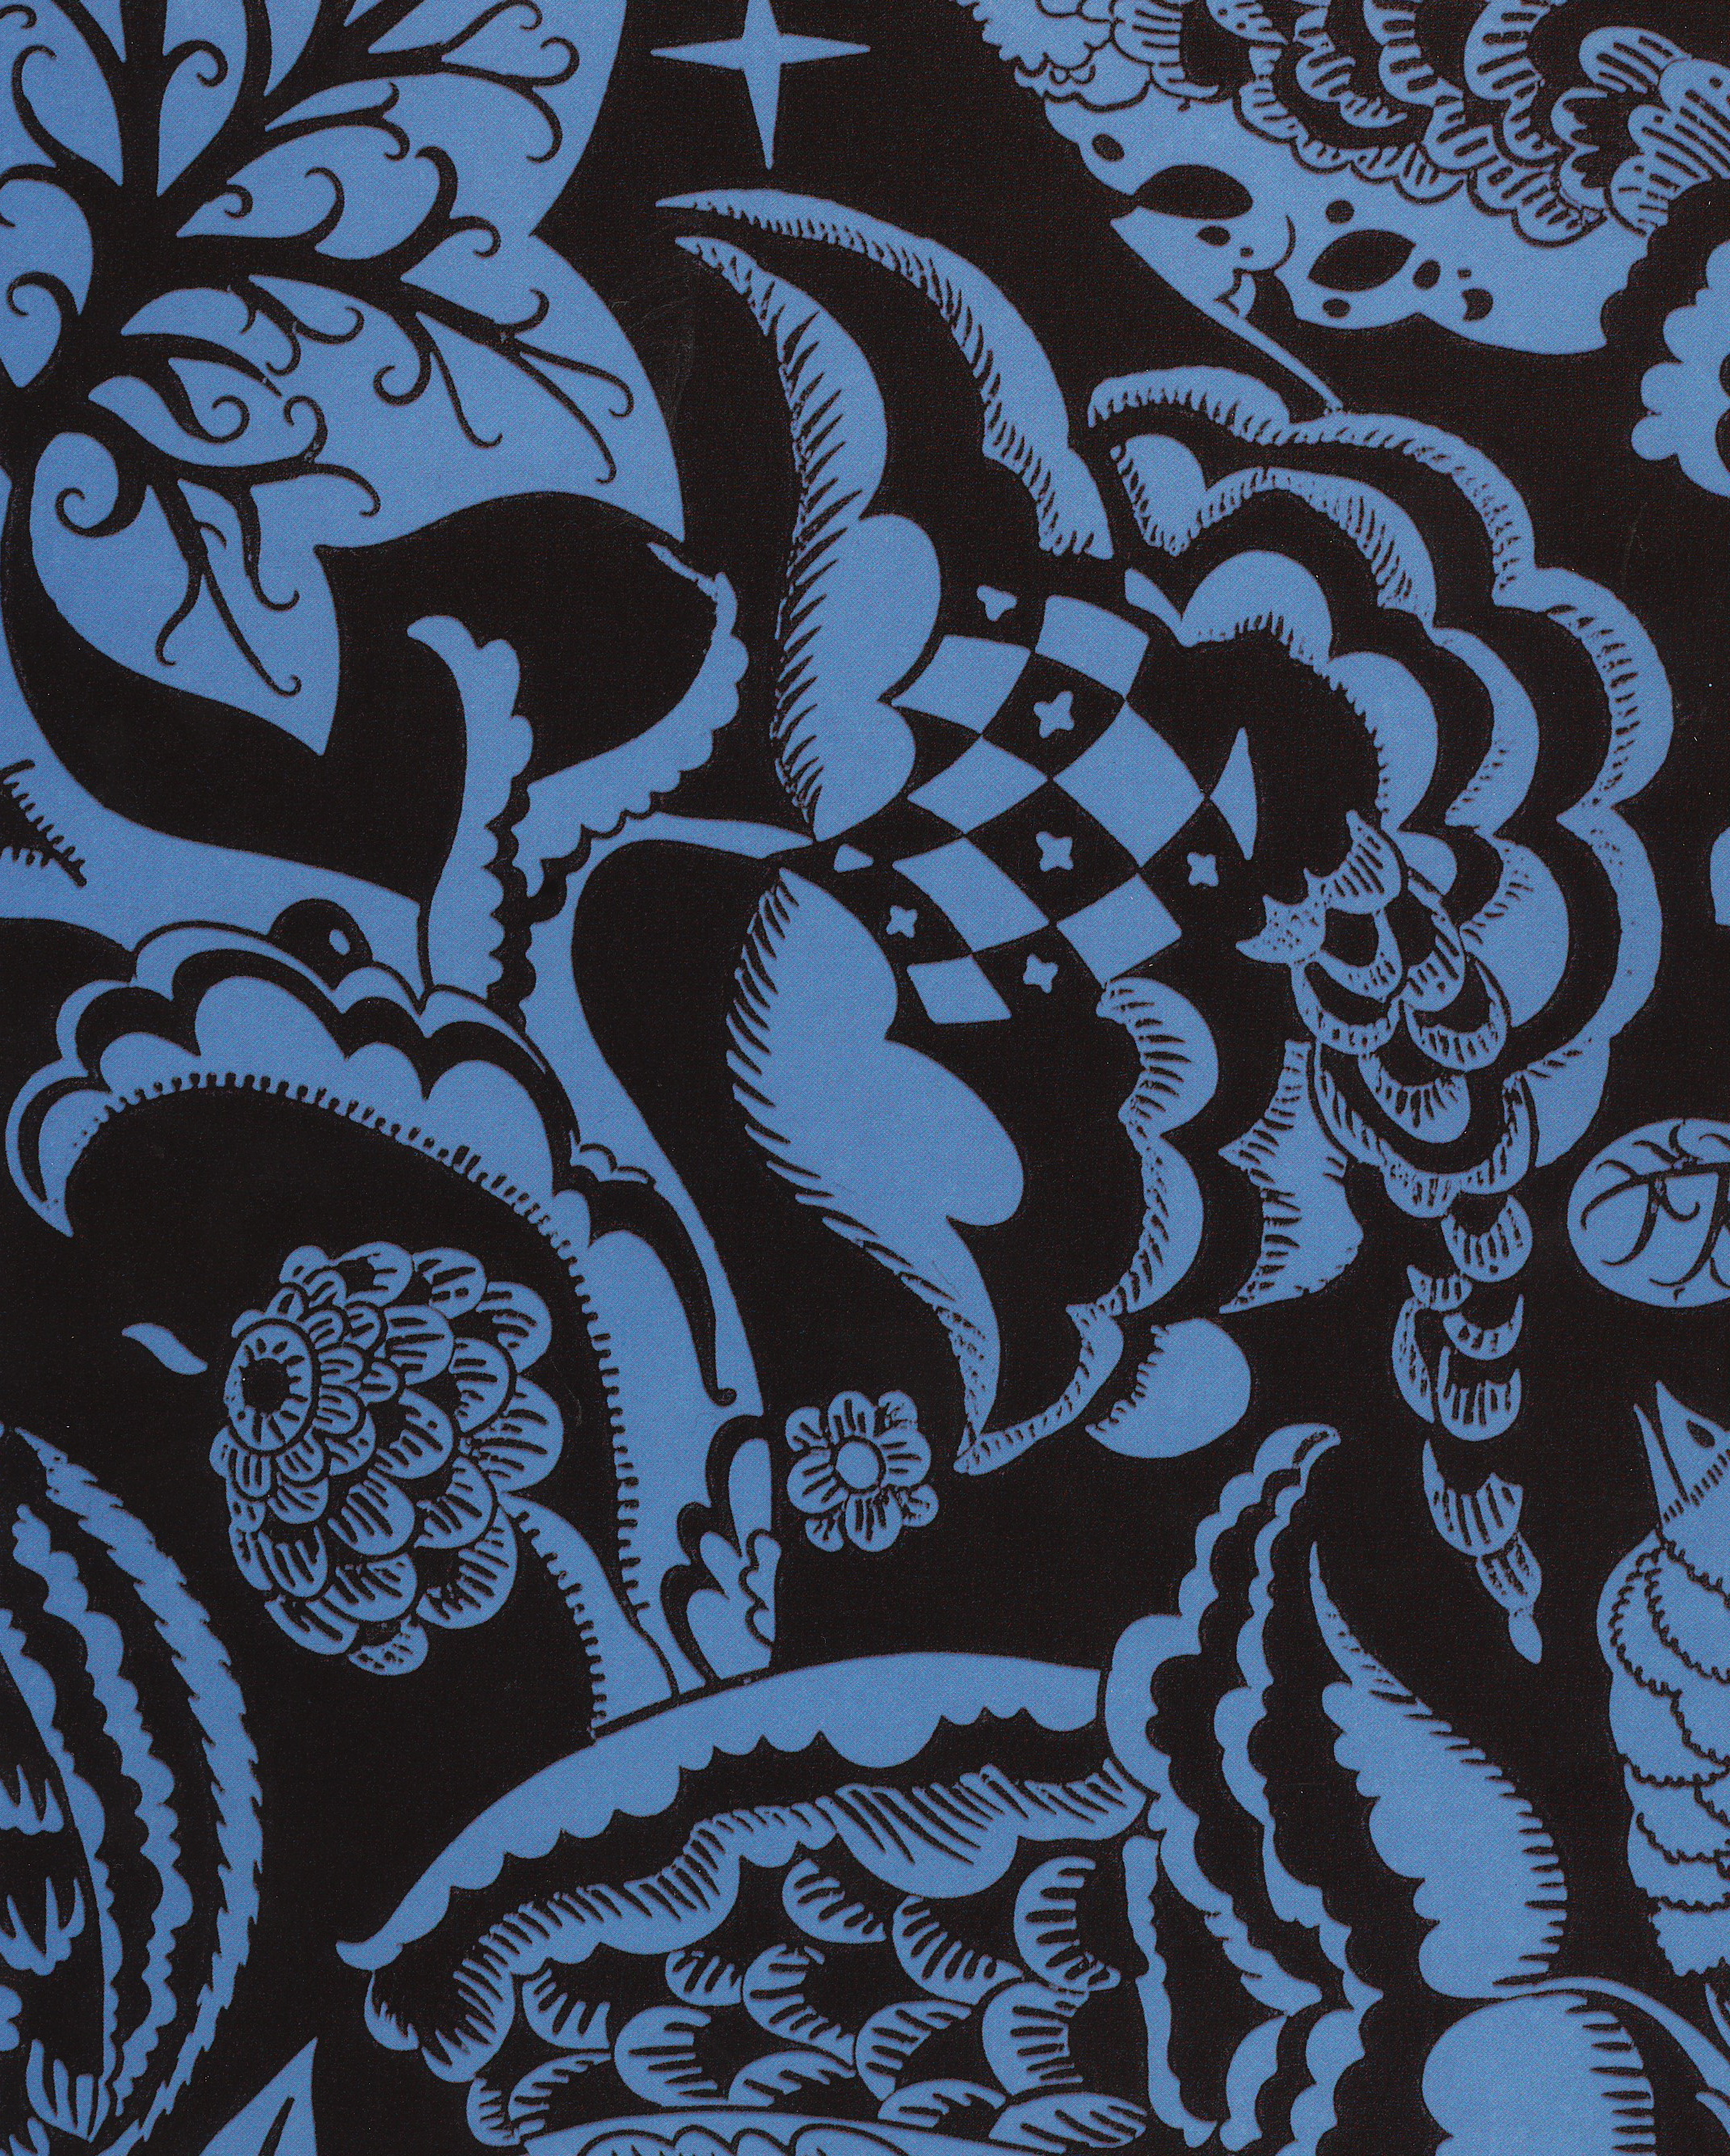 Dagobert Peche—Wallpaper design